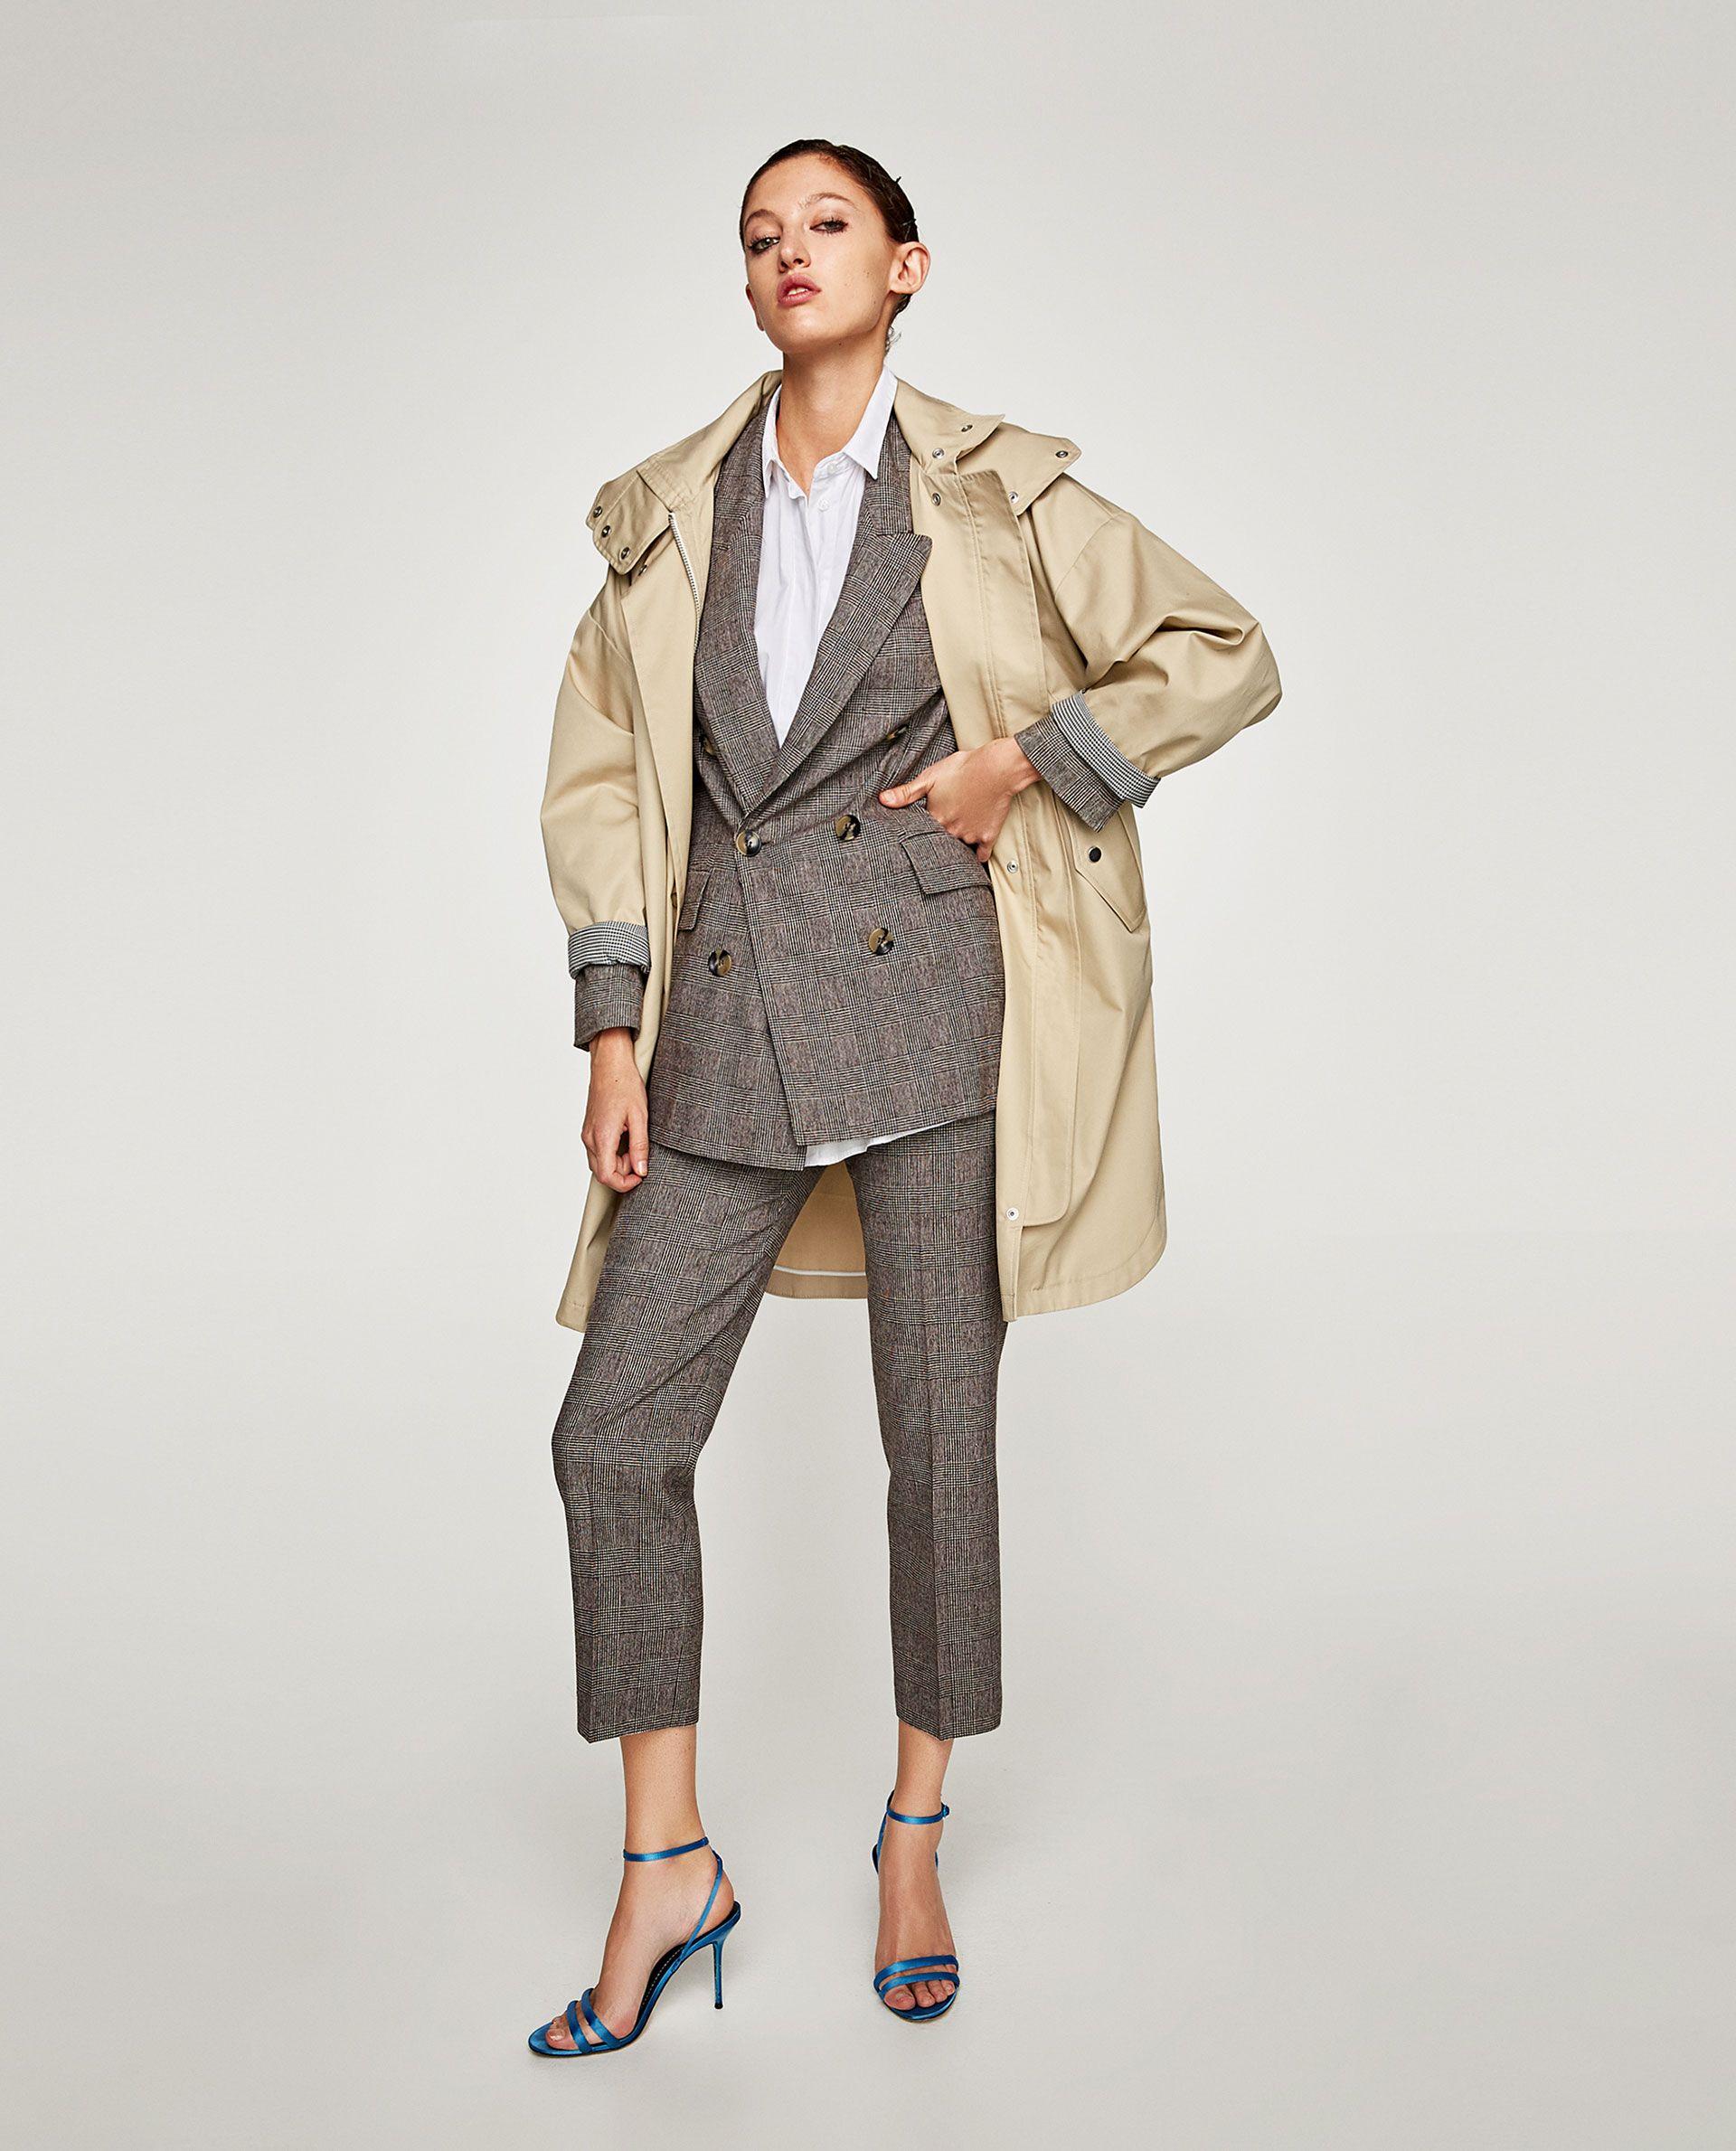 1 Moda De Zara Chaqueta Cuadros Cruzada Imagen Pinterest TAqwCC